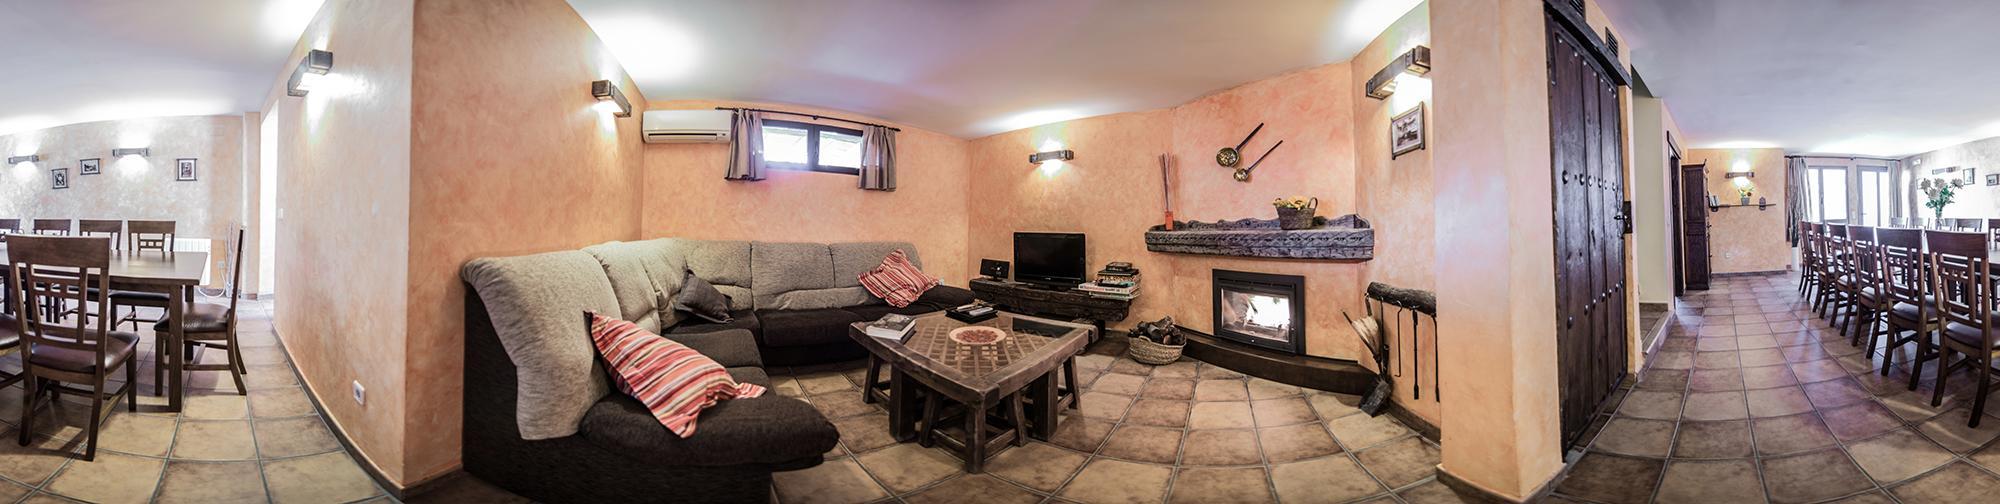 Apartamento vacacional Gálvez, Toledo